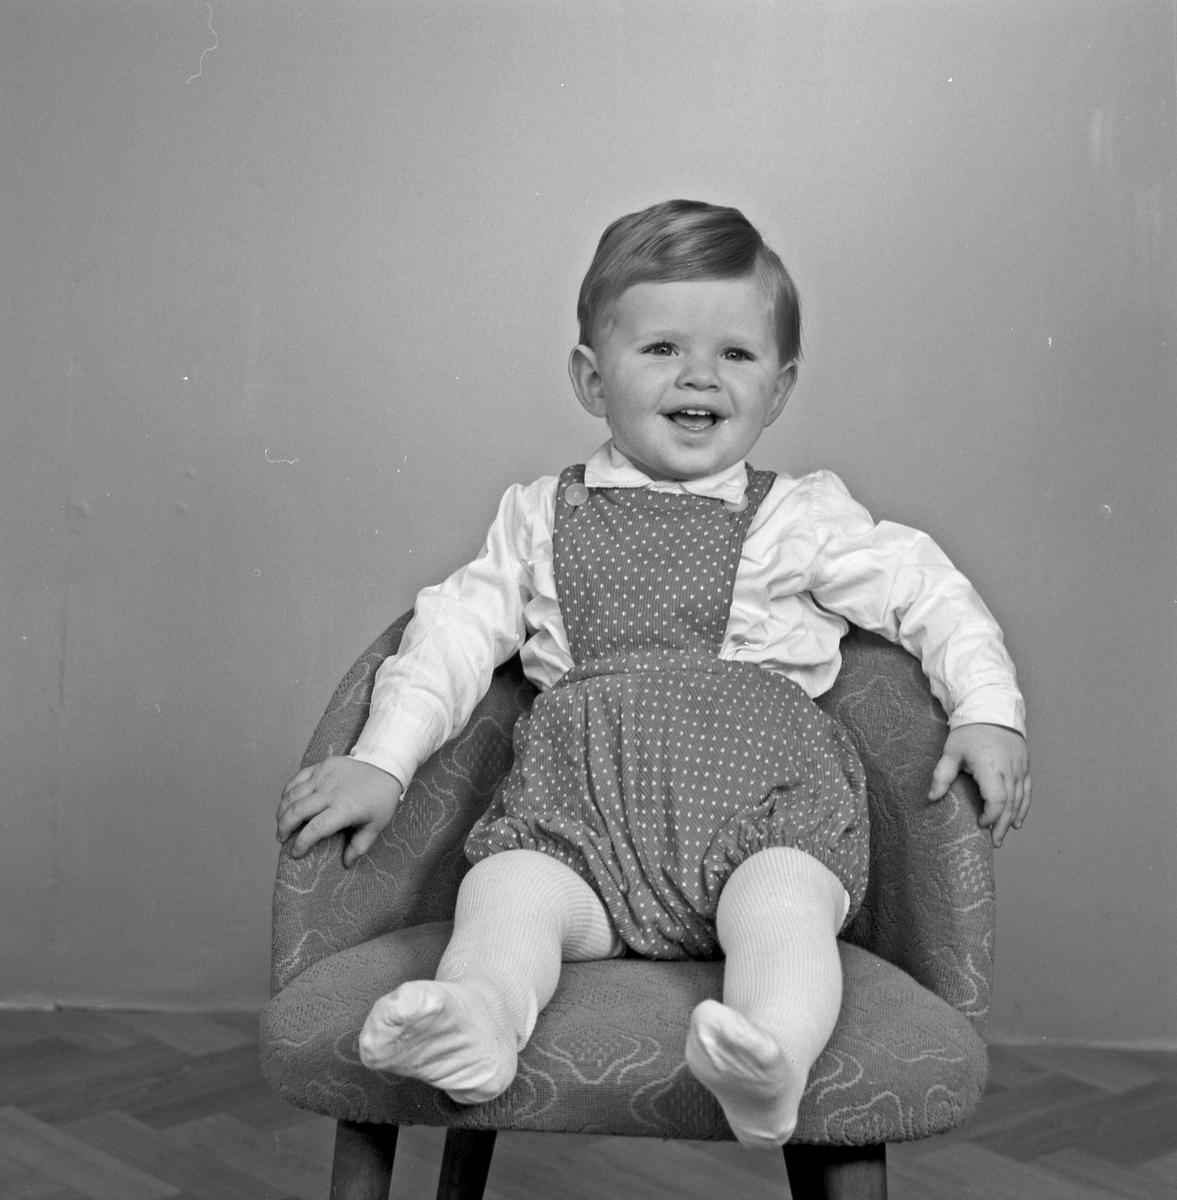 Portrett - liten gutt - bestiller Kristoffer Sydnes